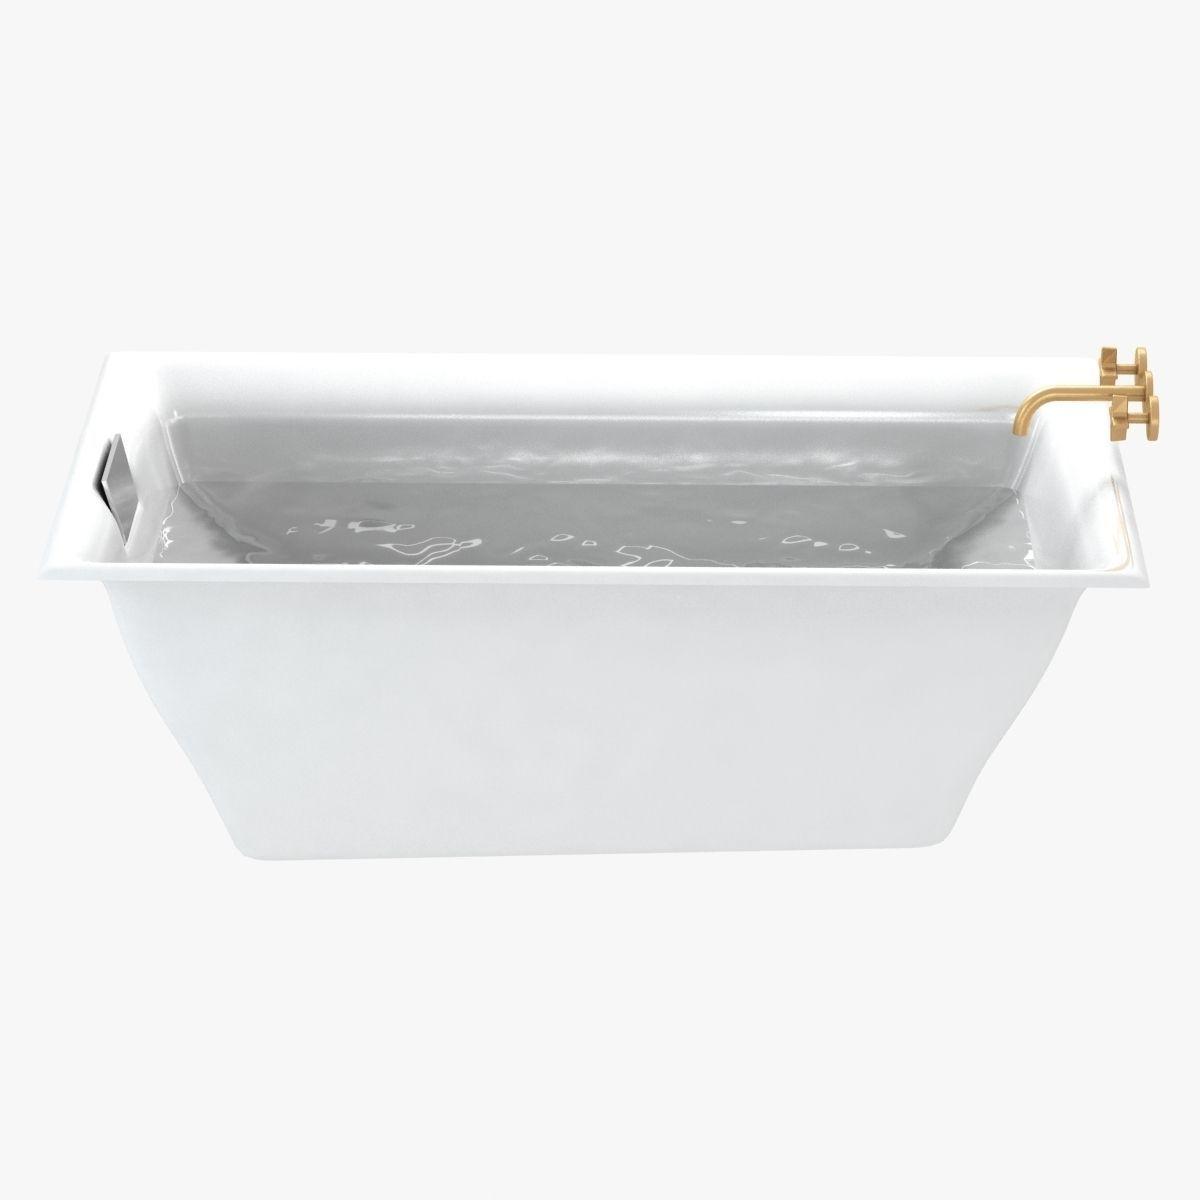 Kohler Bath Kallista Tap 3d Model Max Obj 3ds Fbx Mtl